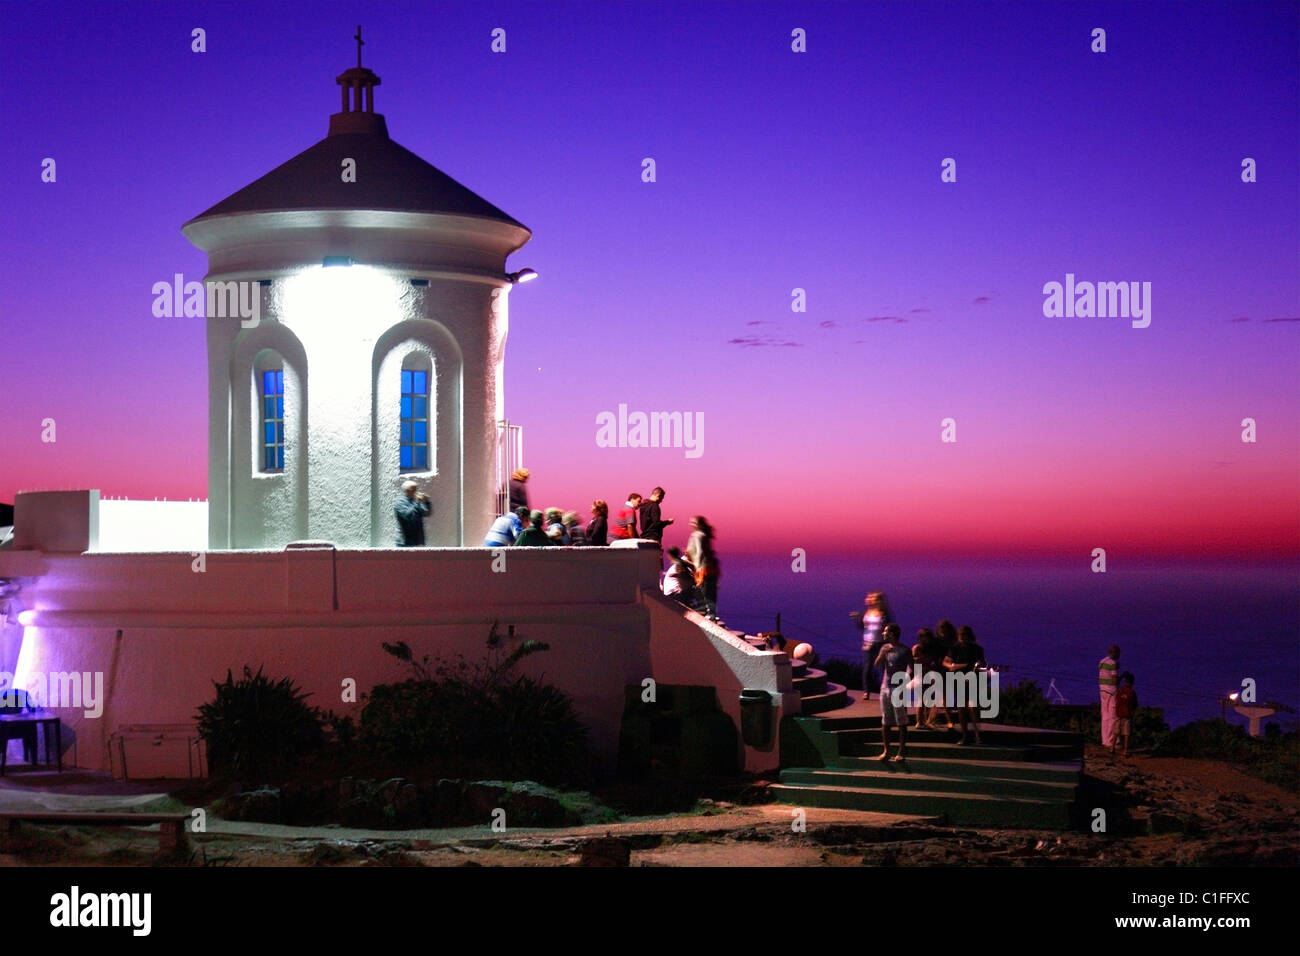 Small Church at cerro San Antonio top, in Piriapolis, Maldonado, Uruguay, south america - Stock Image